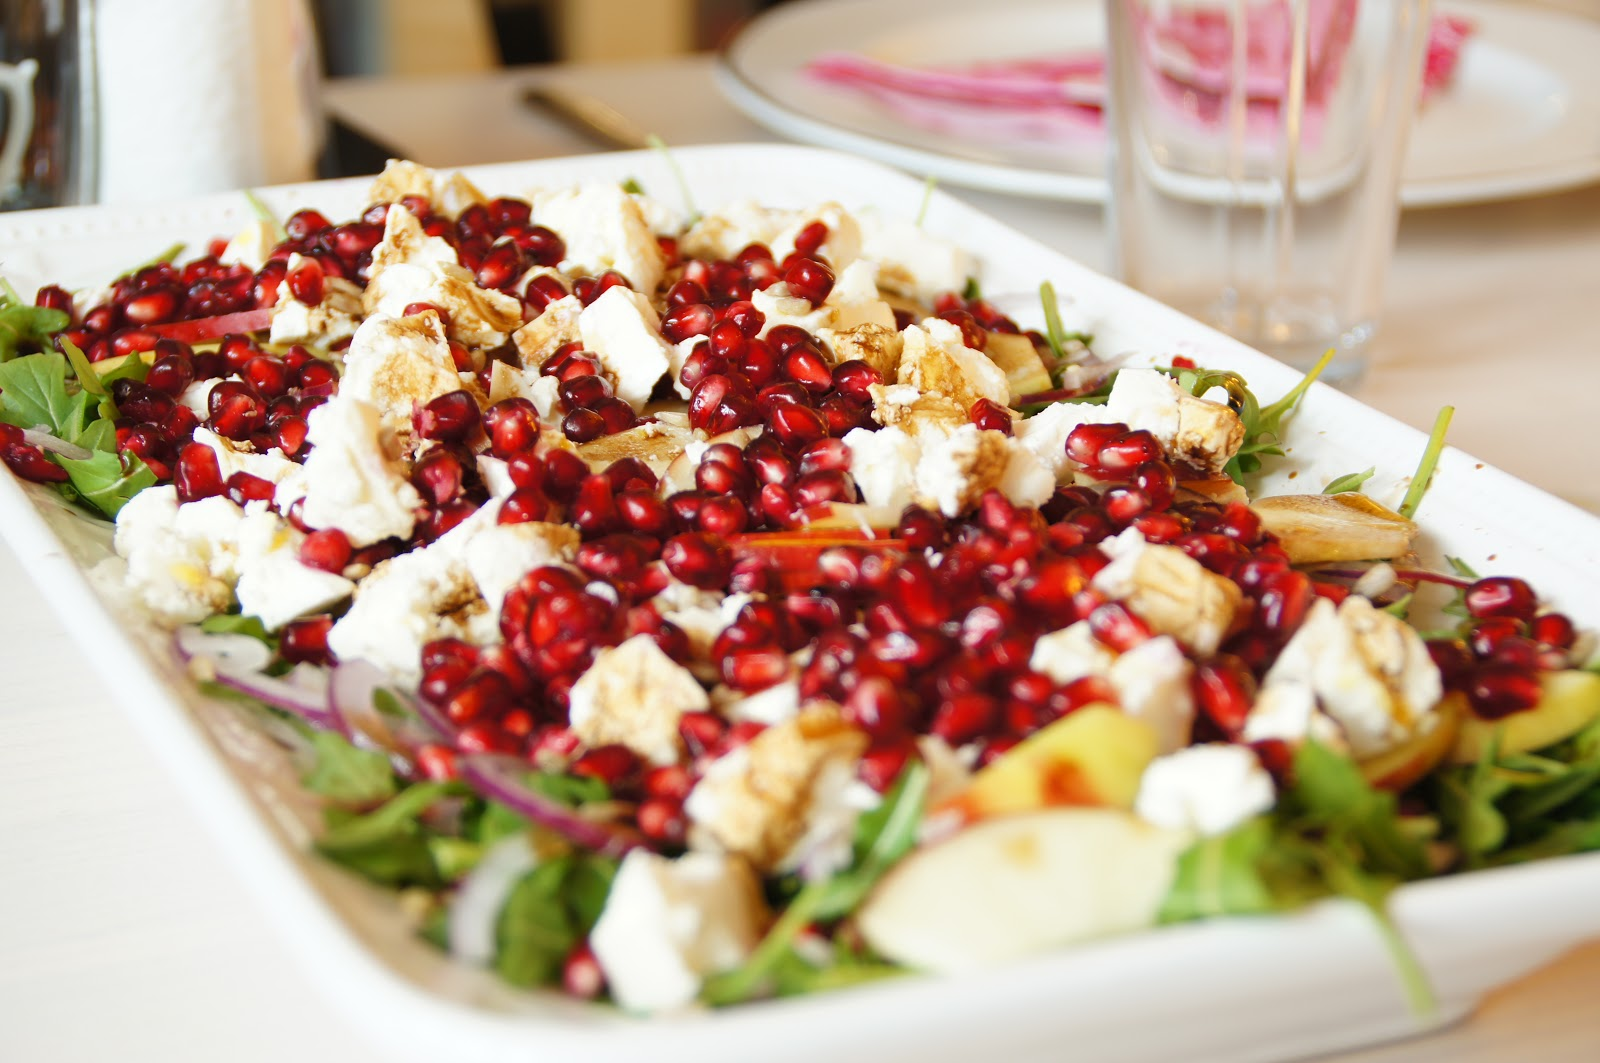 Coco Co Grønne Fisk Rød Salat Samt Pære Crumble